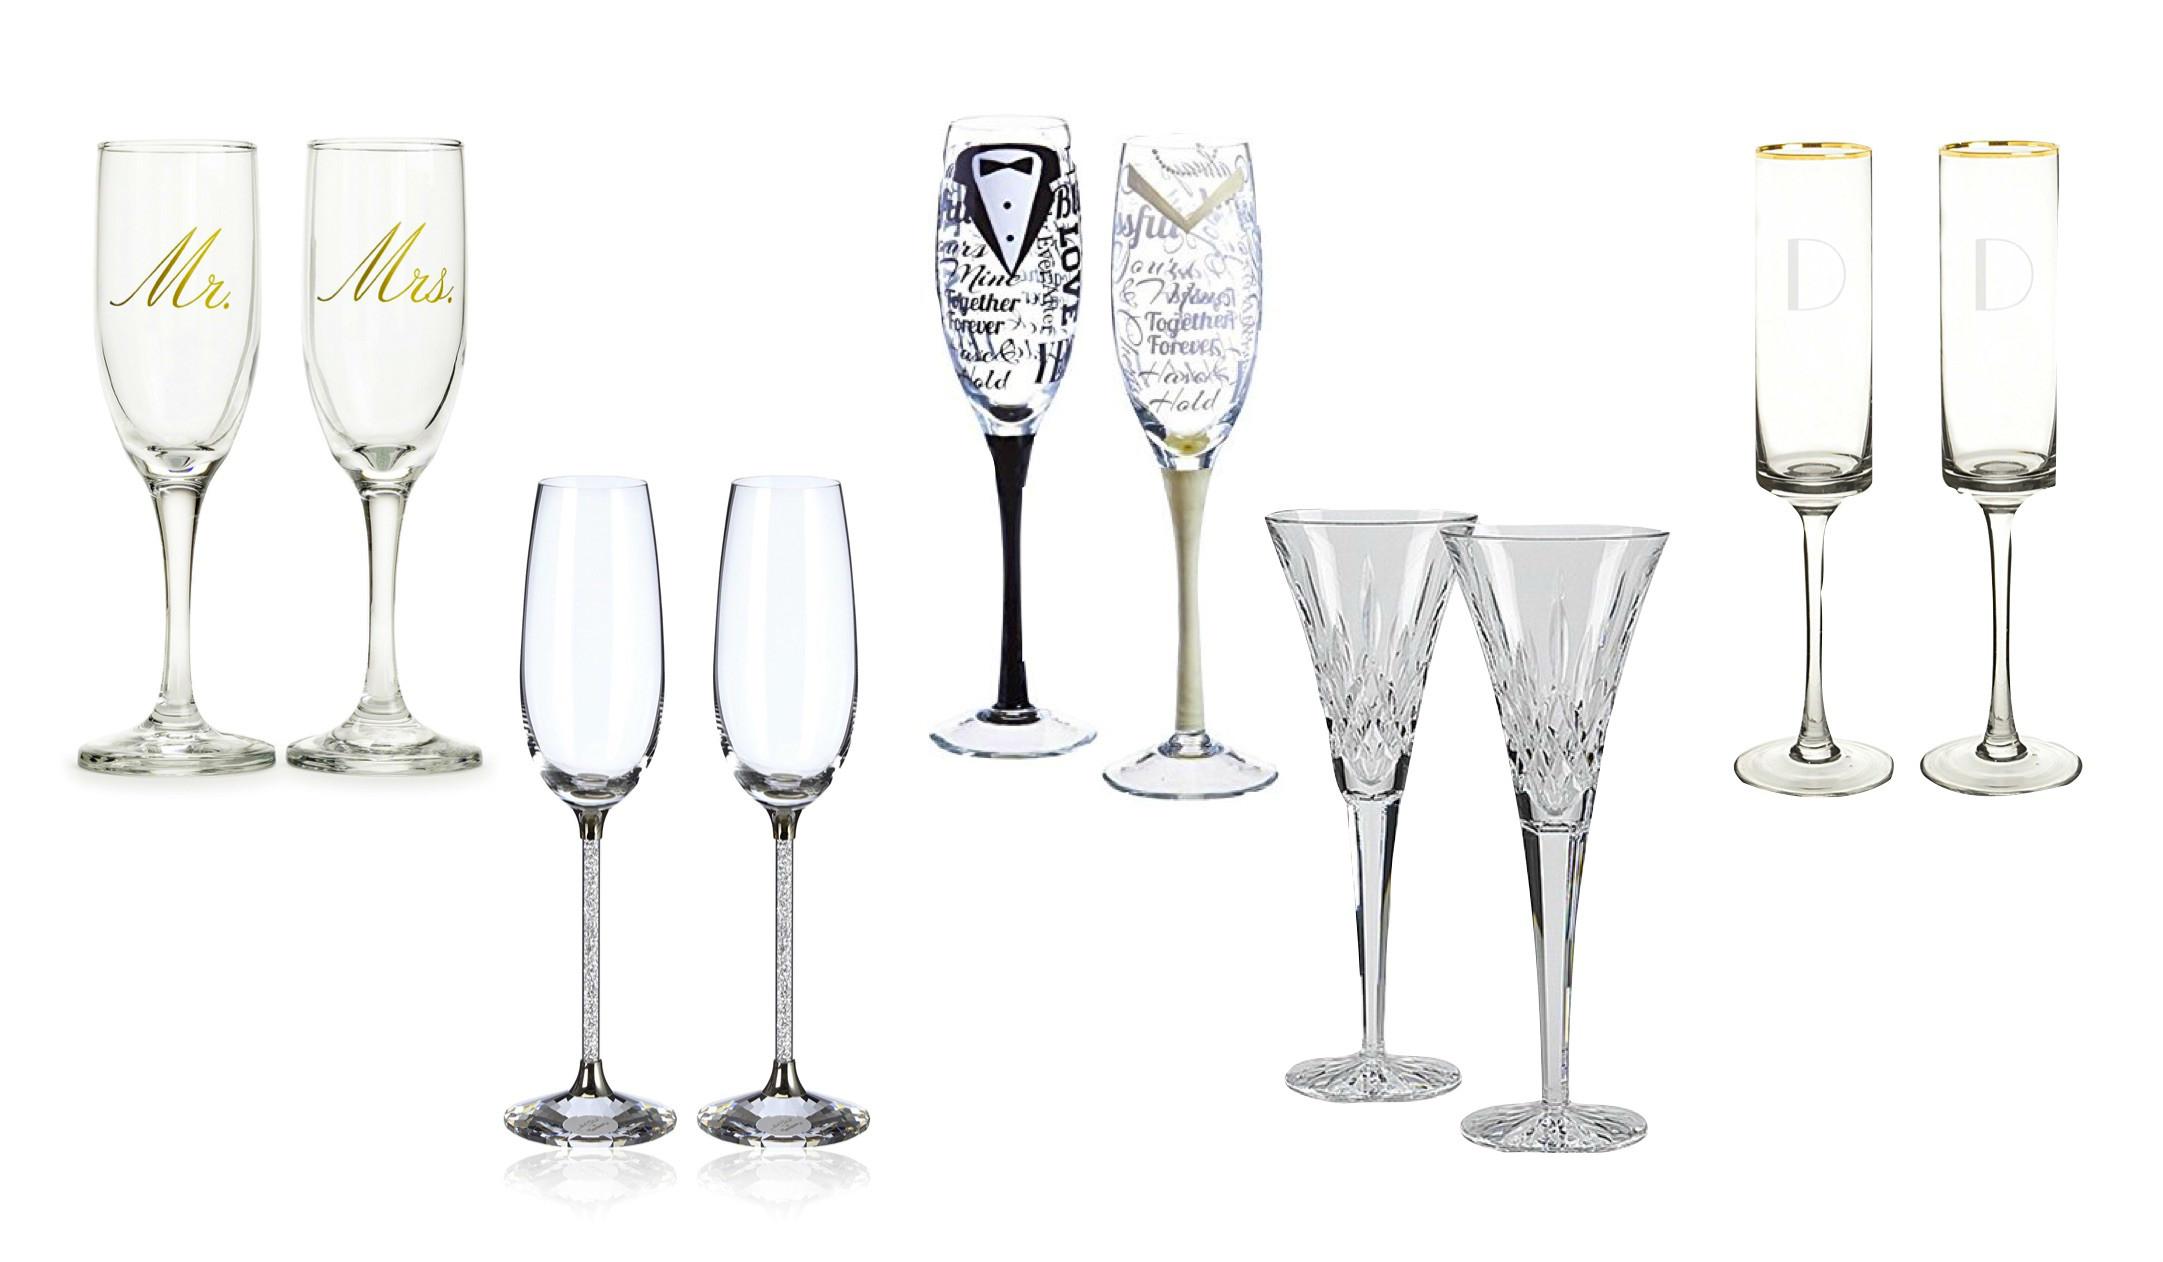 toasting flutes, champagne glasses, champagne flutes, wedding glasses, wedding champagne flutes, wedding flutes, wedding toasting flutes, personalized champagne flutes, toasting glasses